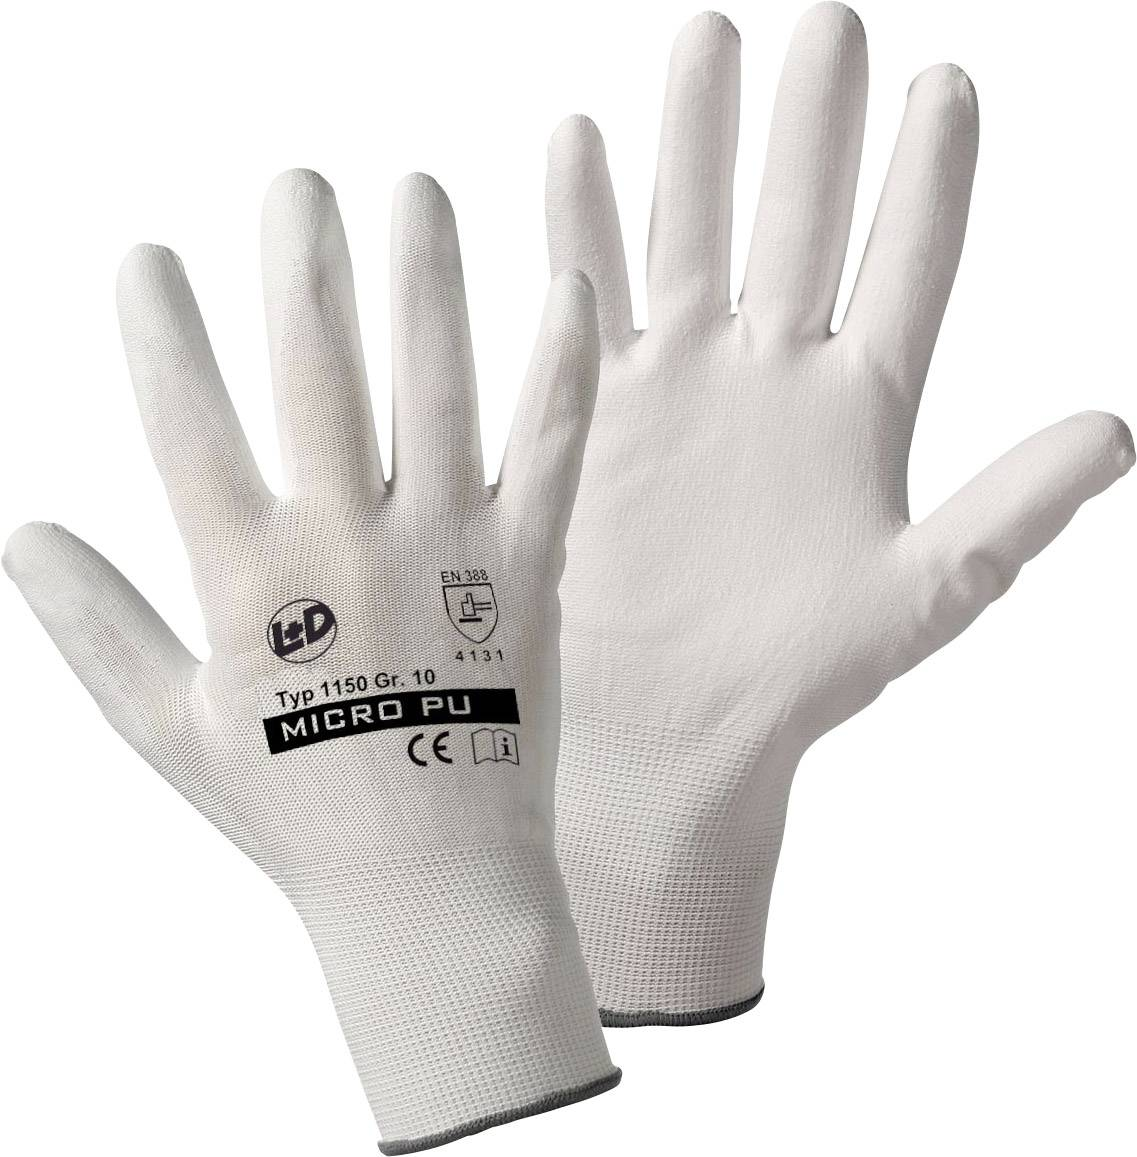 Pracovné rukavice Leipold + Döhle Micro-PU knitted 1150, velikost rukavic: 10, XL